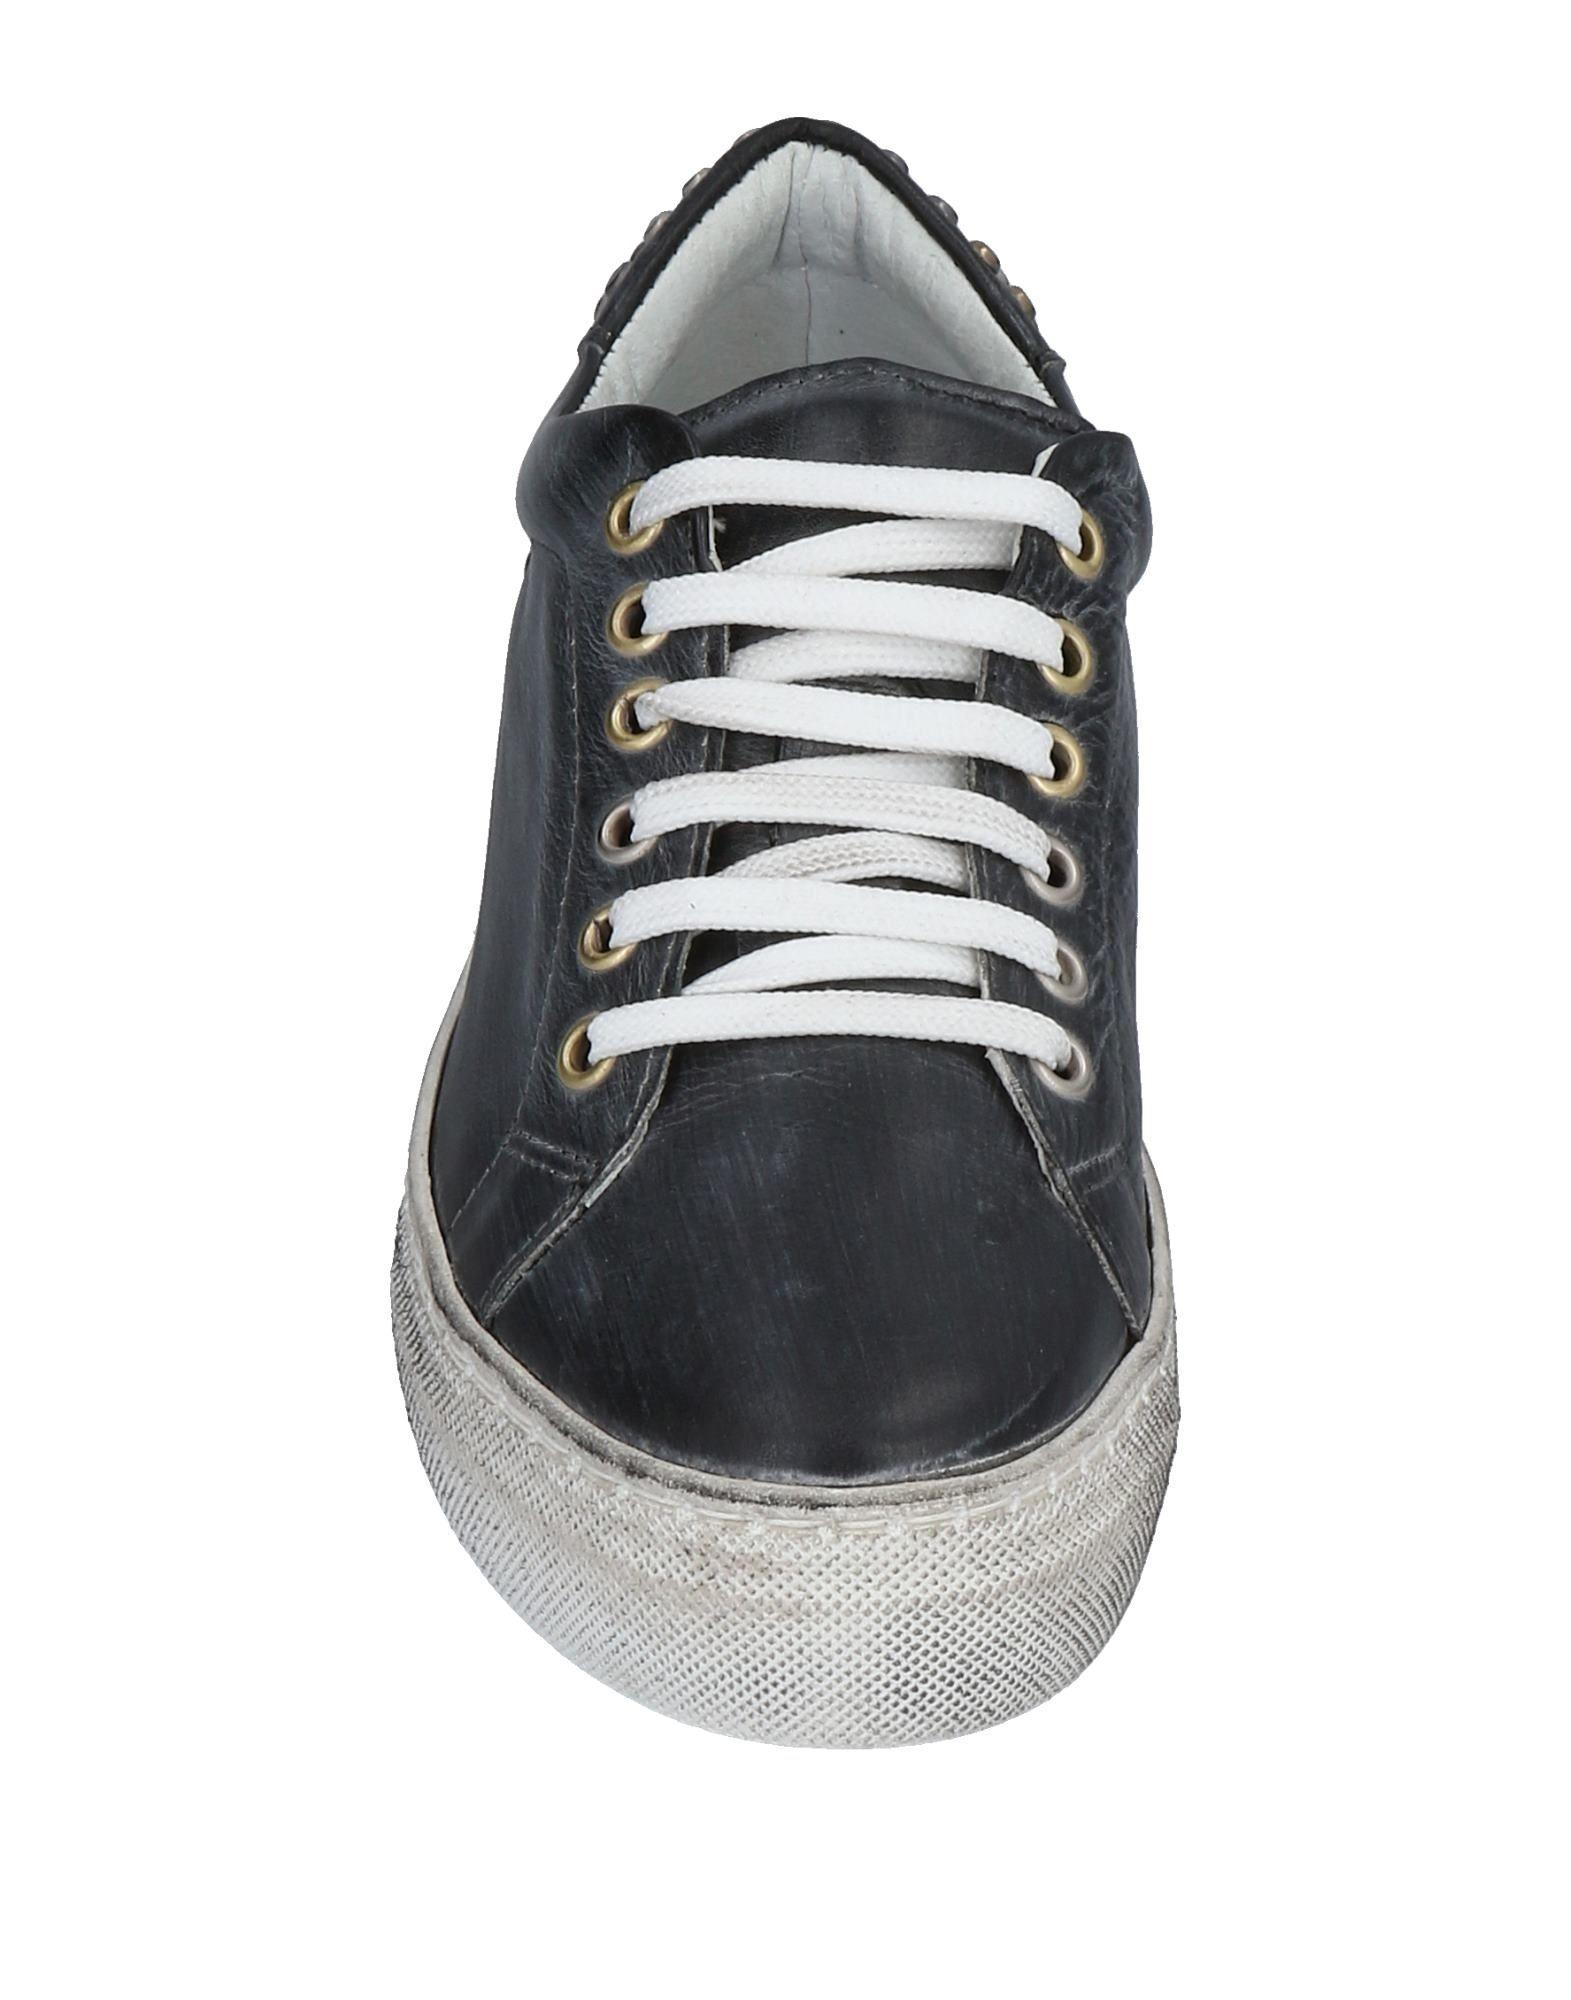 Riccianera Sneakers Damen  beliebte 11488862AL Gute Qualität beliebte  Schuhe a8cb8e